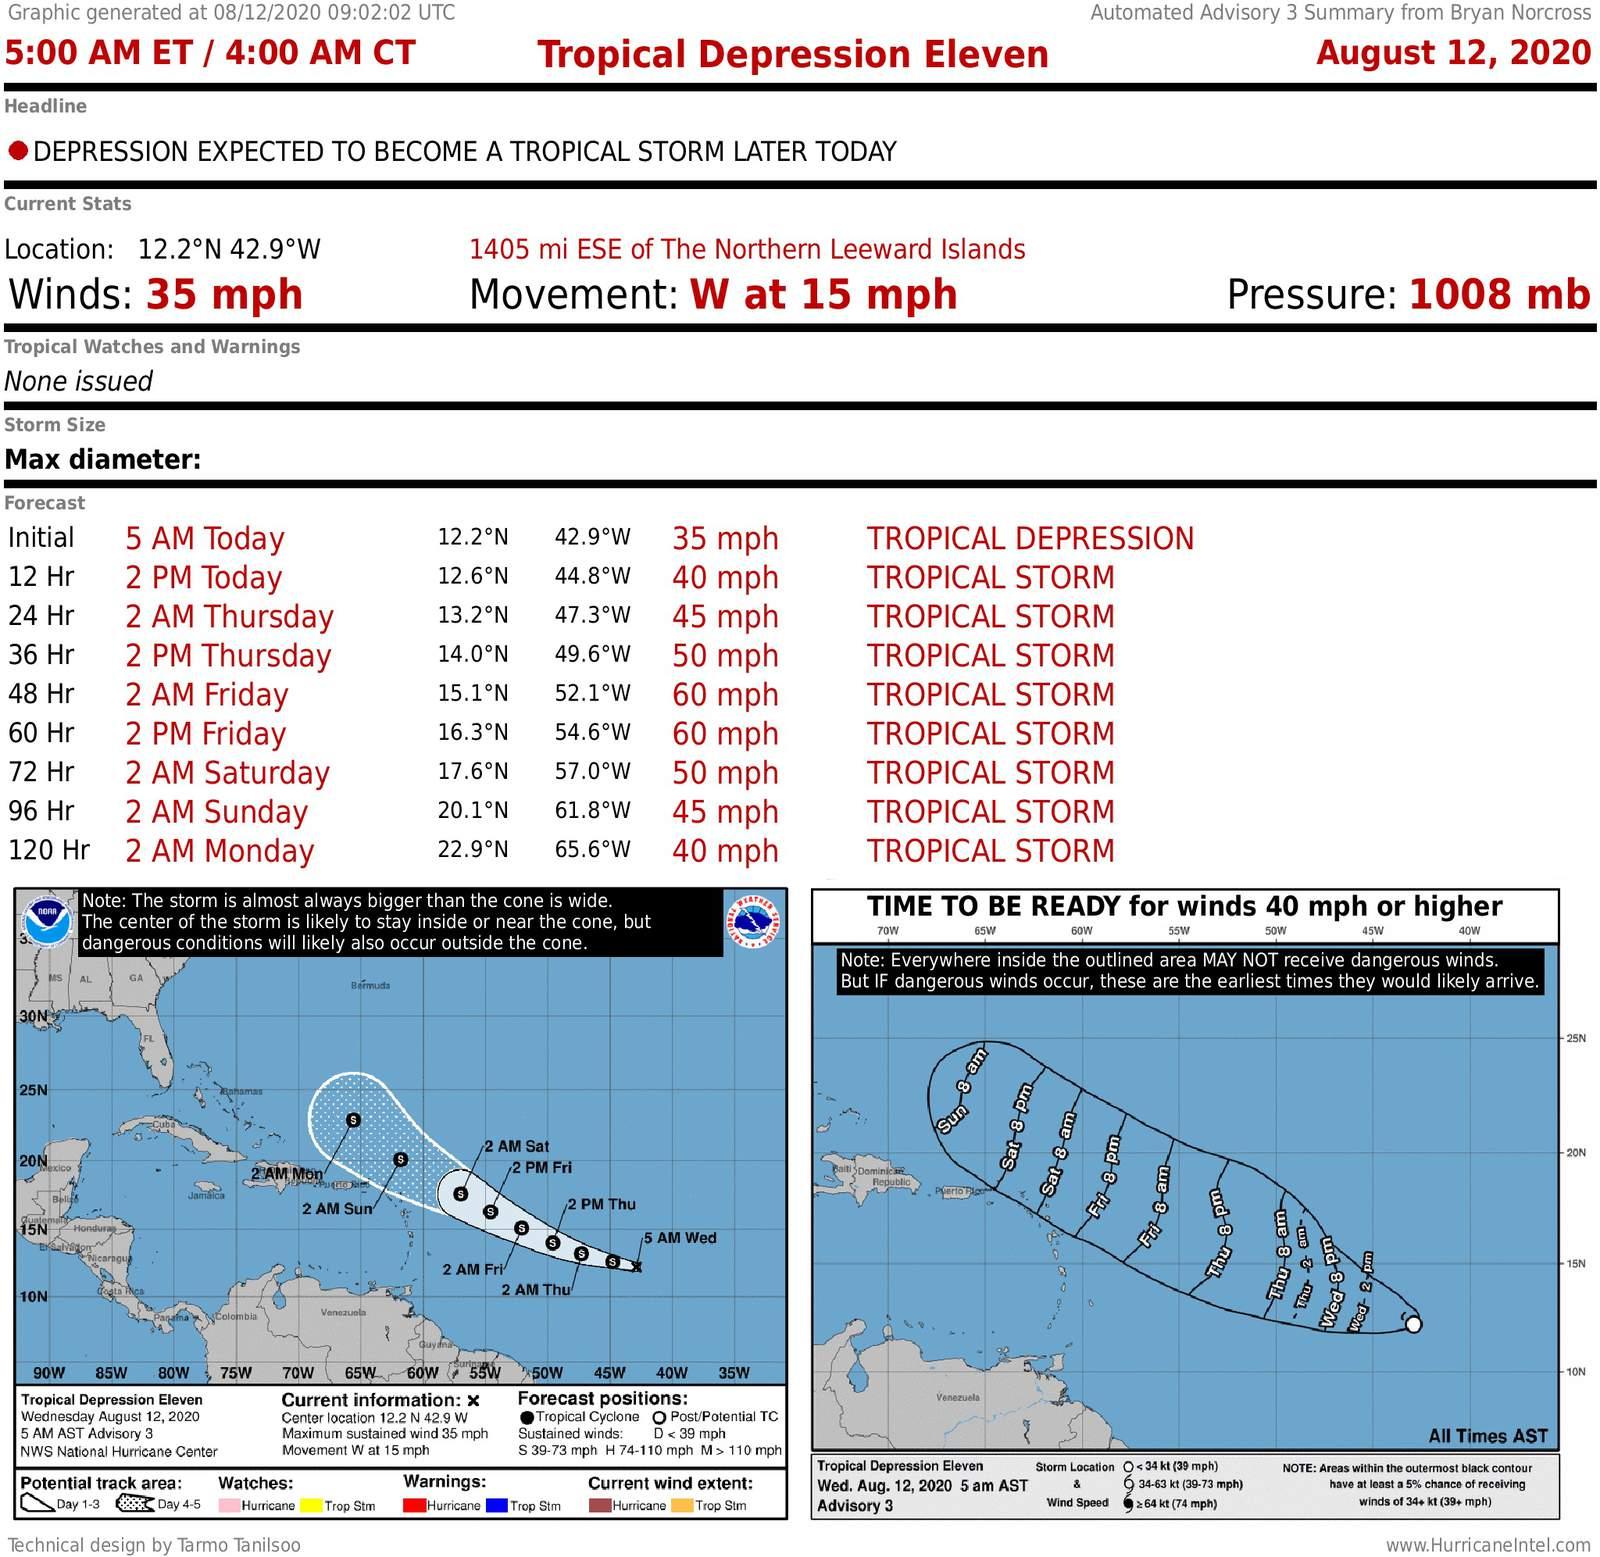 Tropical Depression Once, aviso del miércoles a las 5 am.